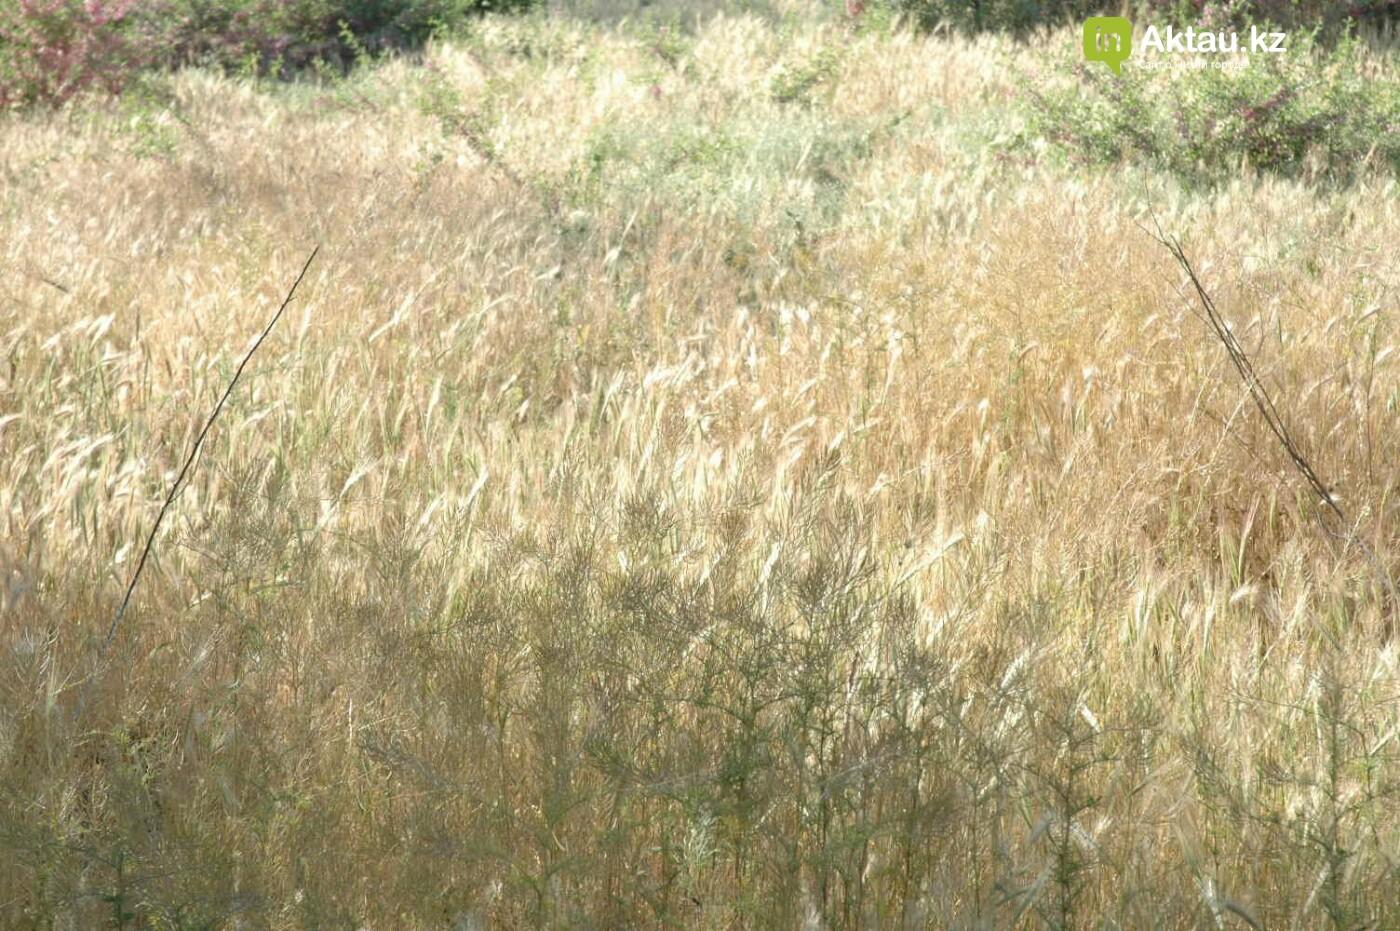 Погибшие от засухи и обезвоживания в Актау исчисляются десятками (ФОТО), фото-44